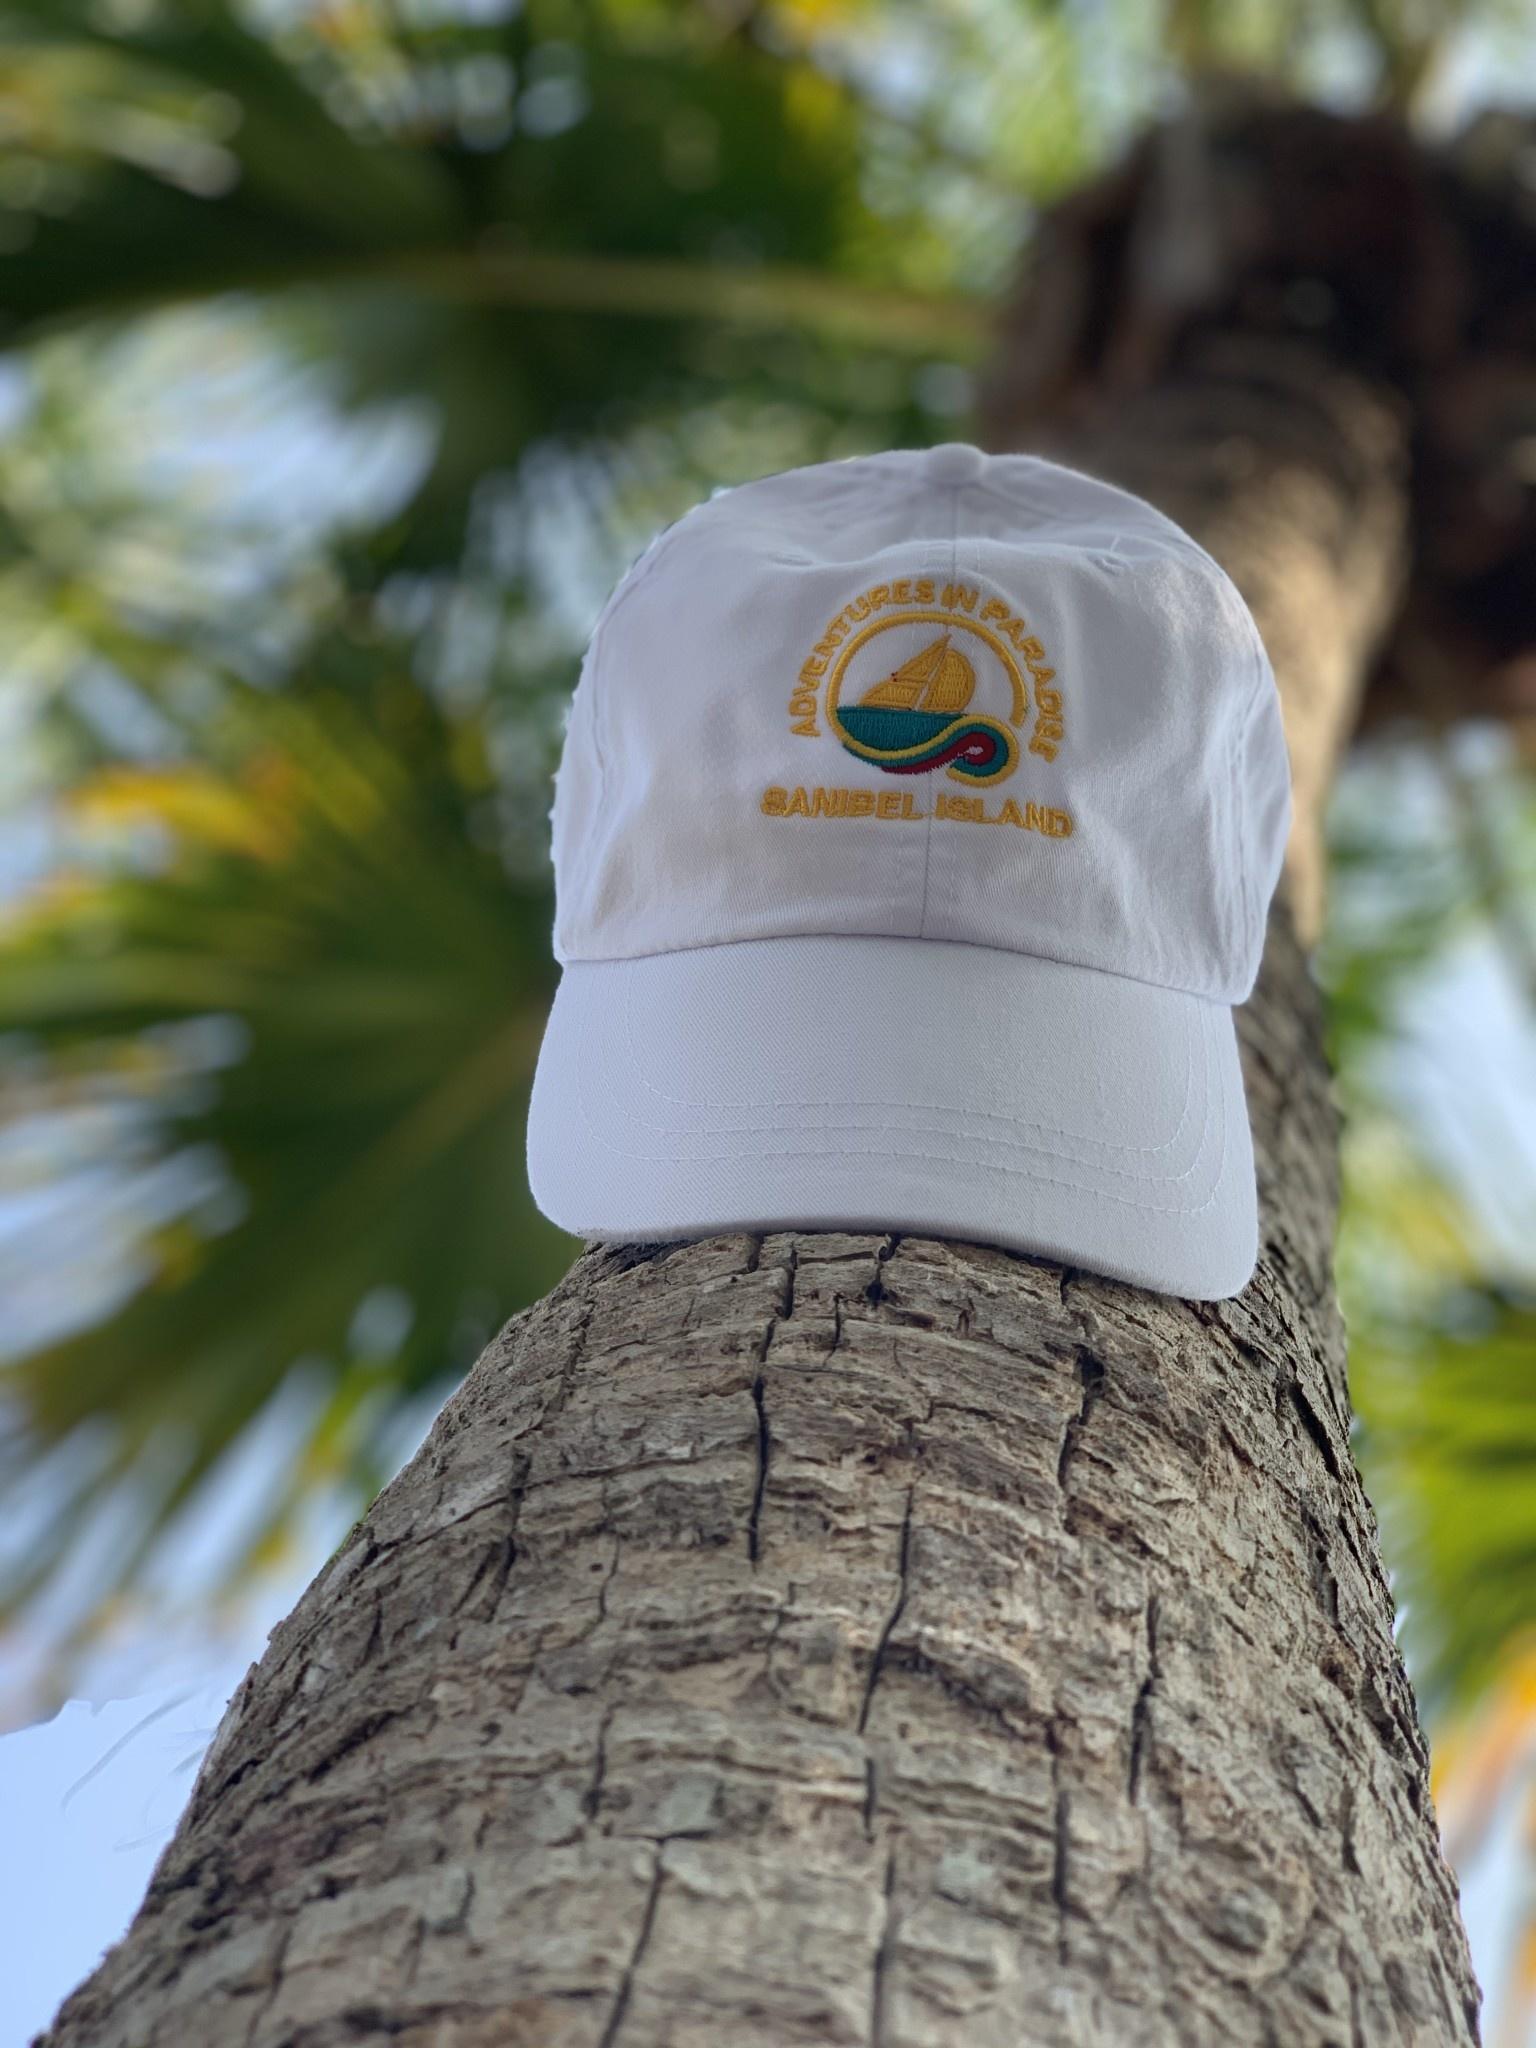 WHISPERING PINES Sanibel Island Hat - White